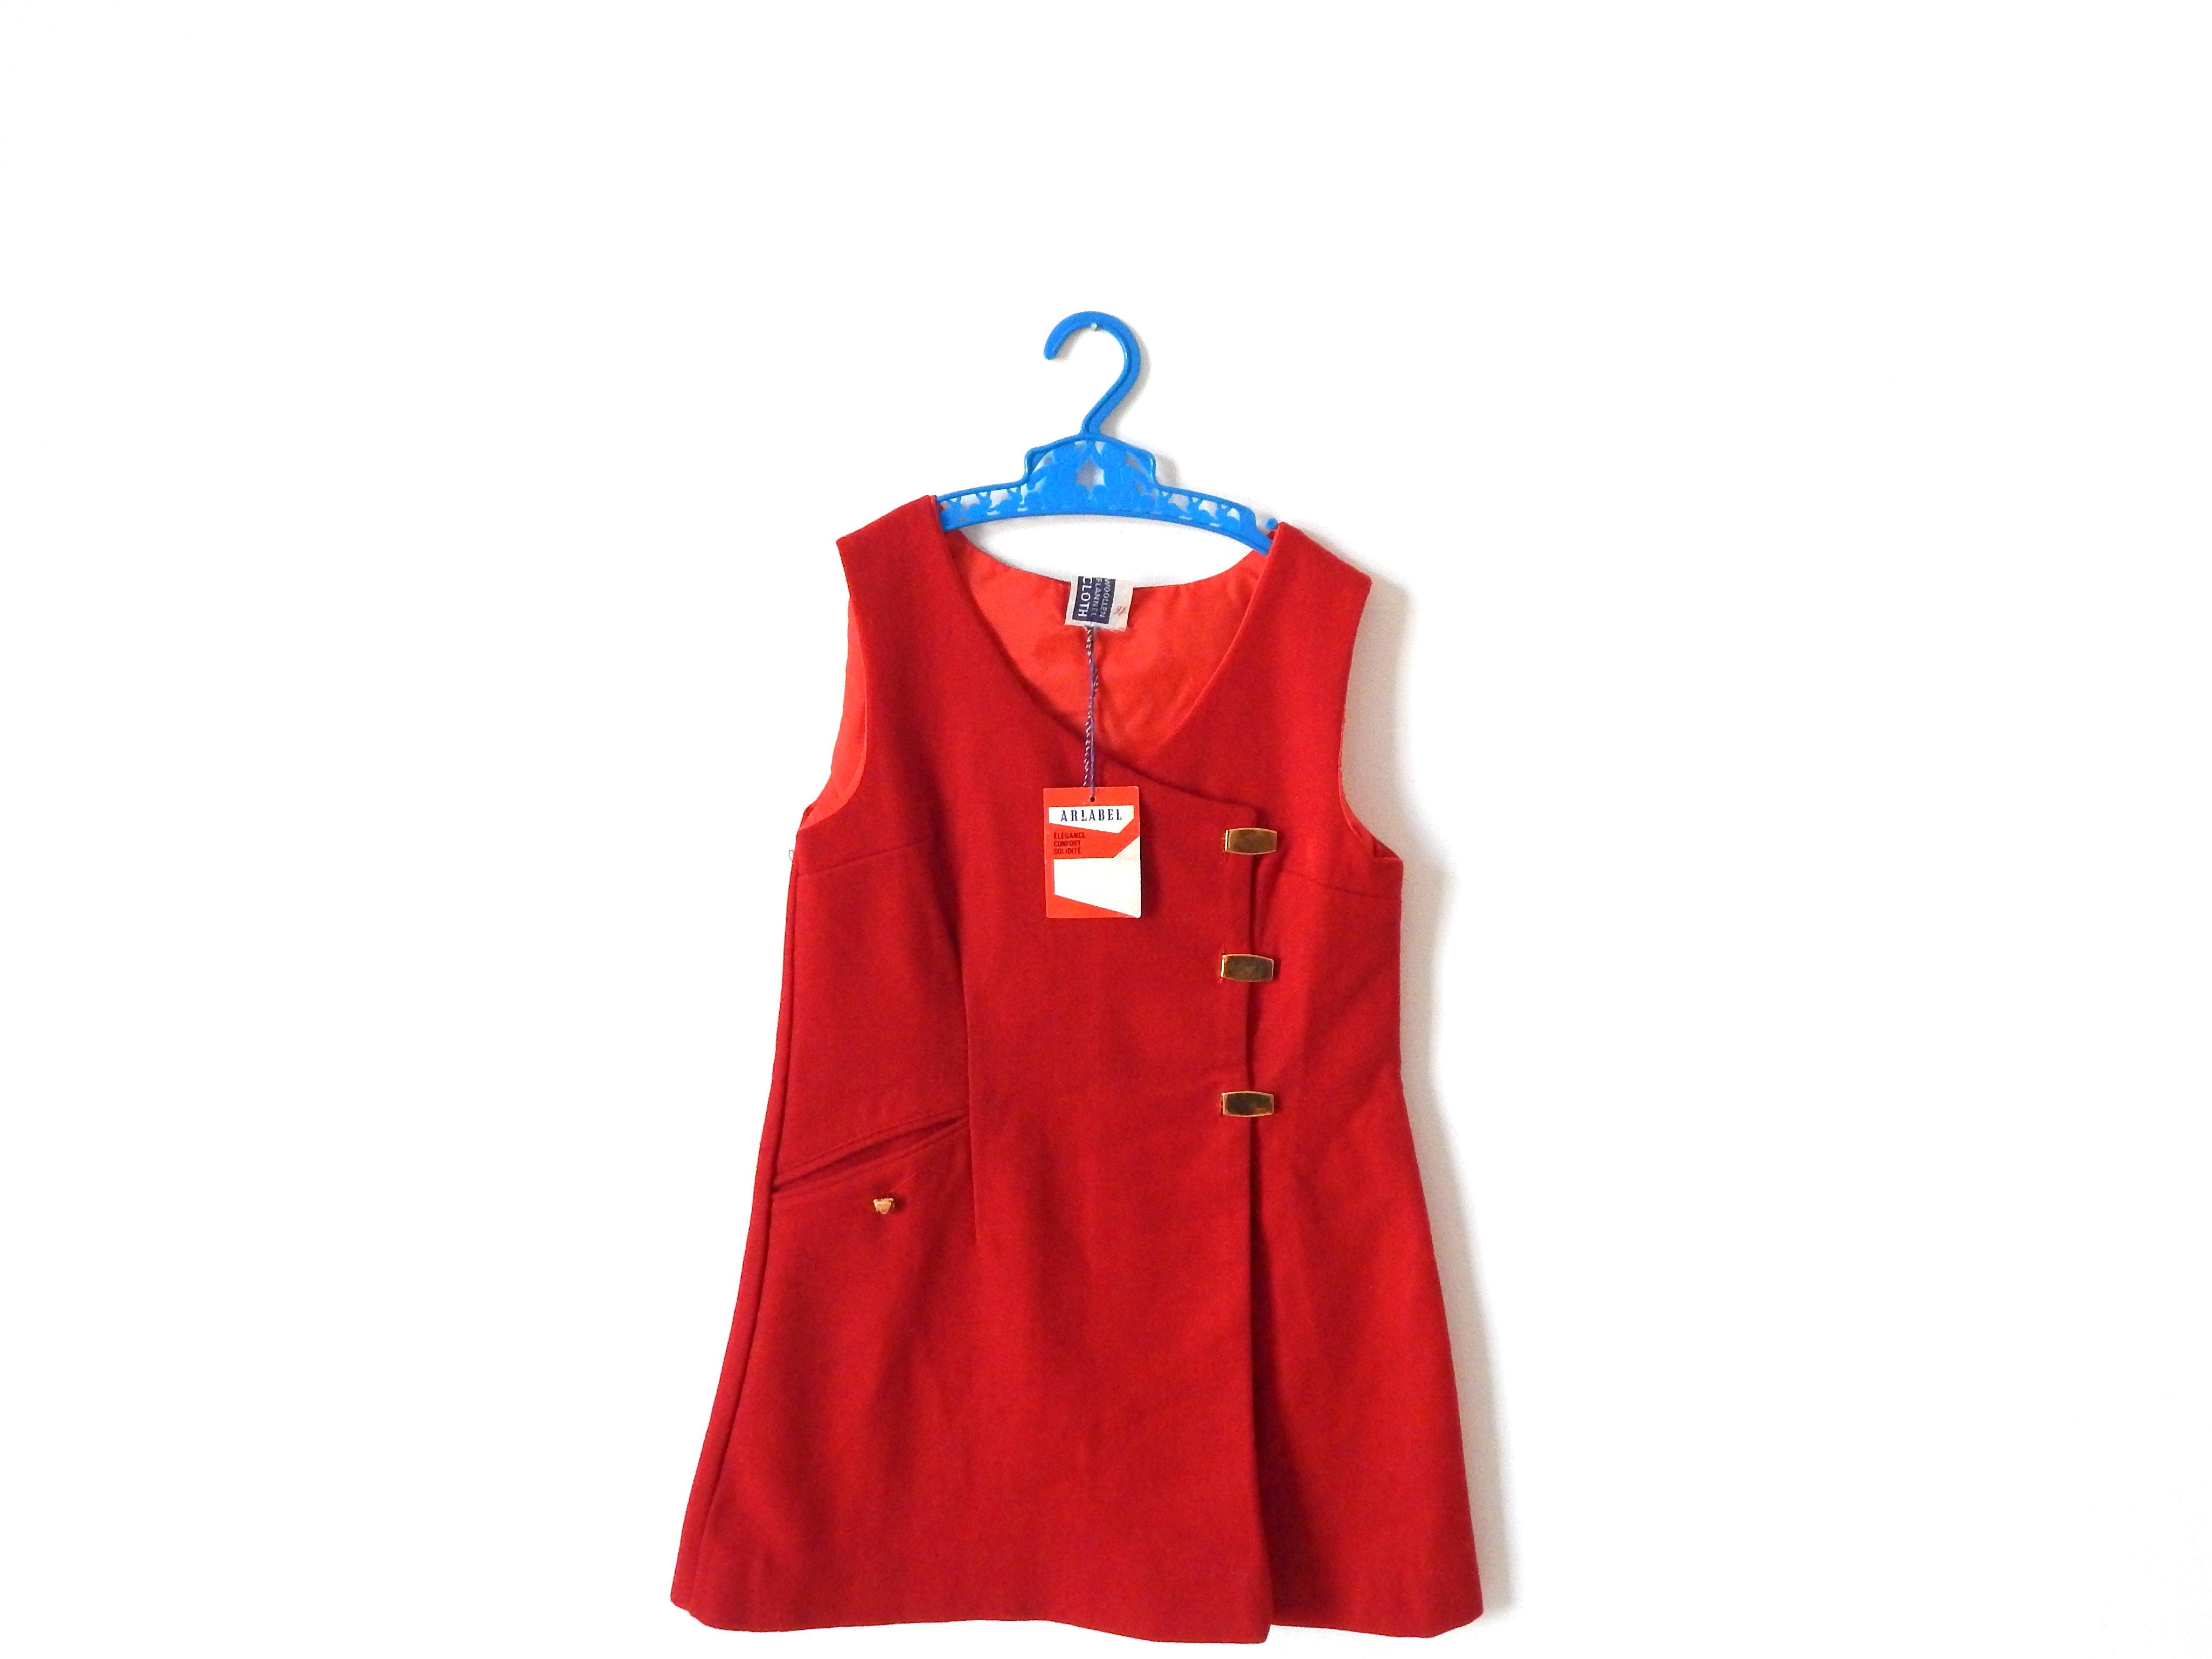 Age 6 red dress shirt